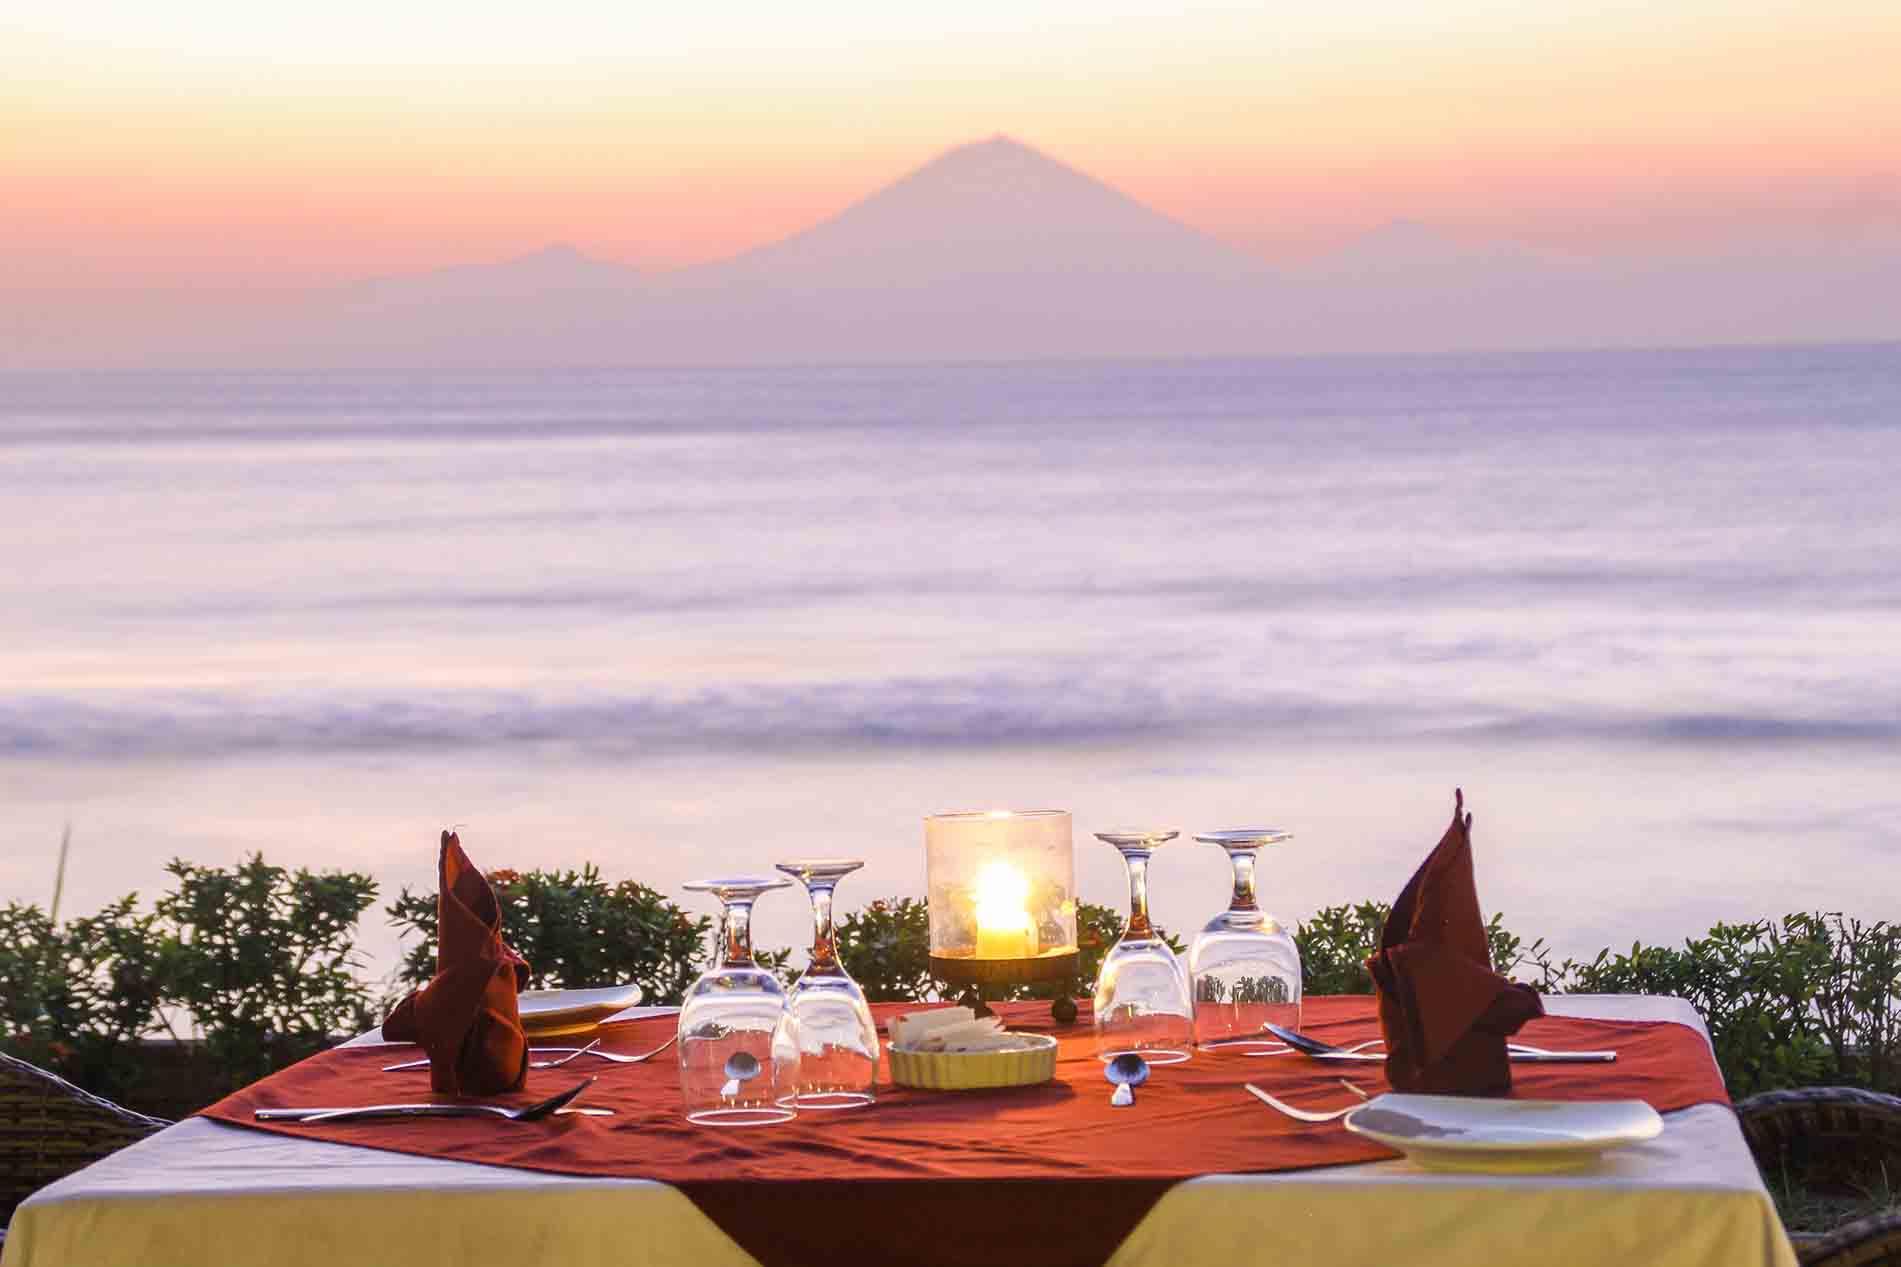 Limasatu Resort By Baio Lombok Beach Fiesta  Ke Bali Dan We Provide A Delicious Meal With Unique Restaurant Decoration